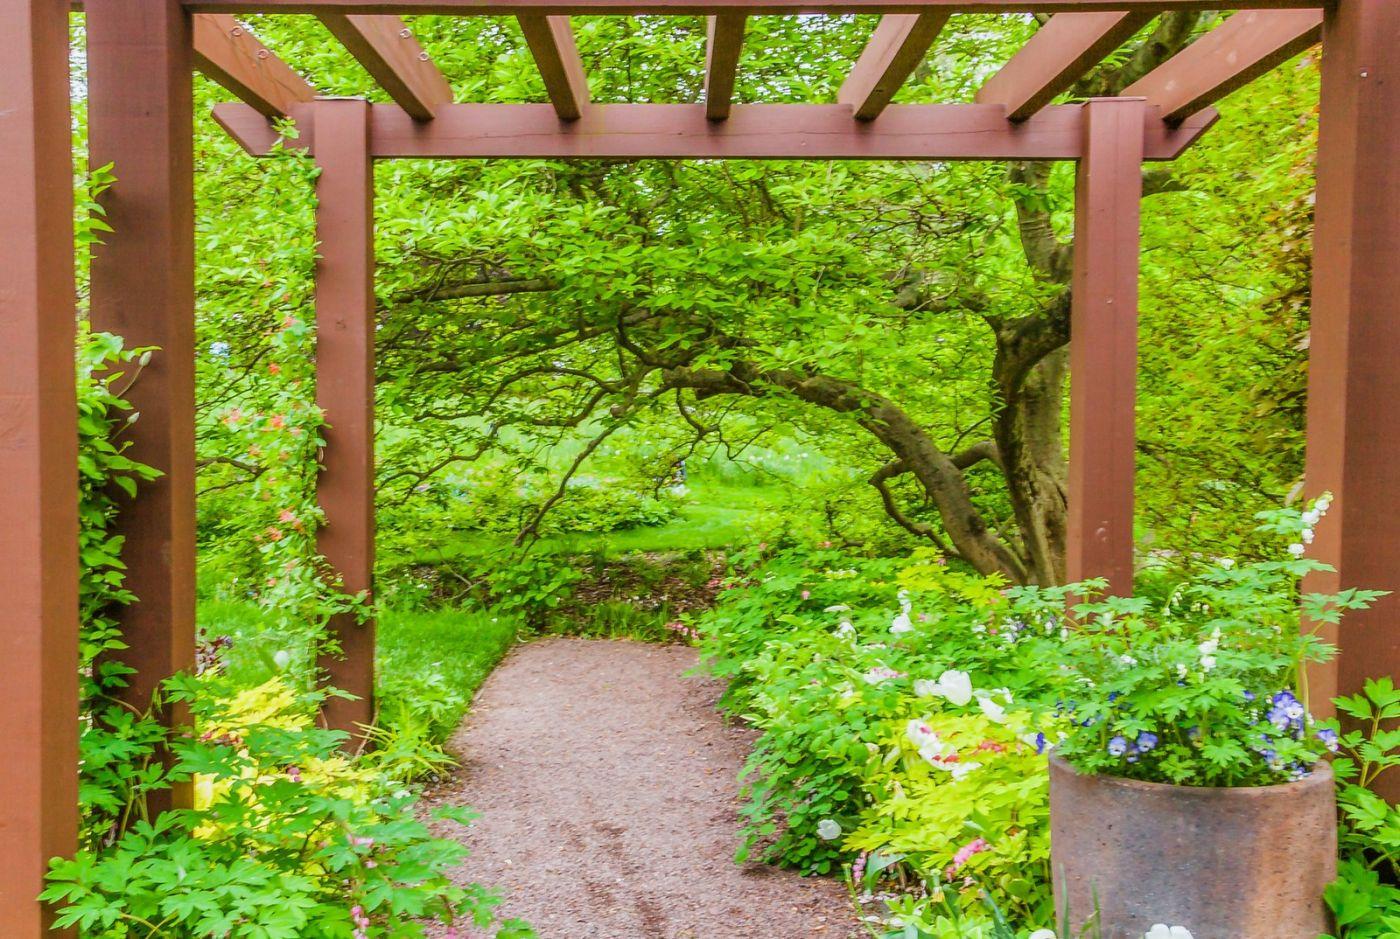 Chanticleer花园,一景一画_图1-10